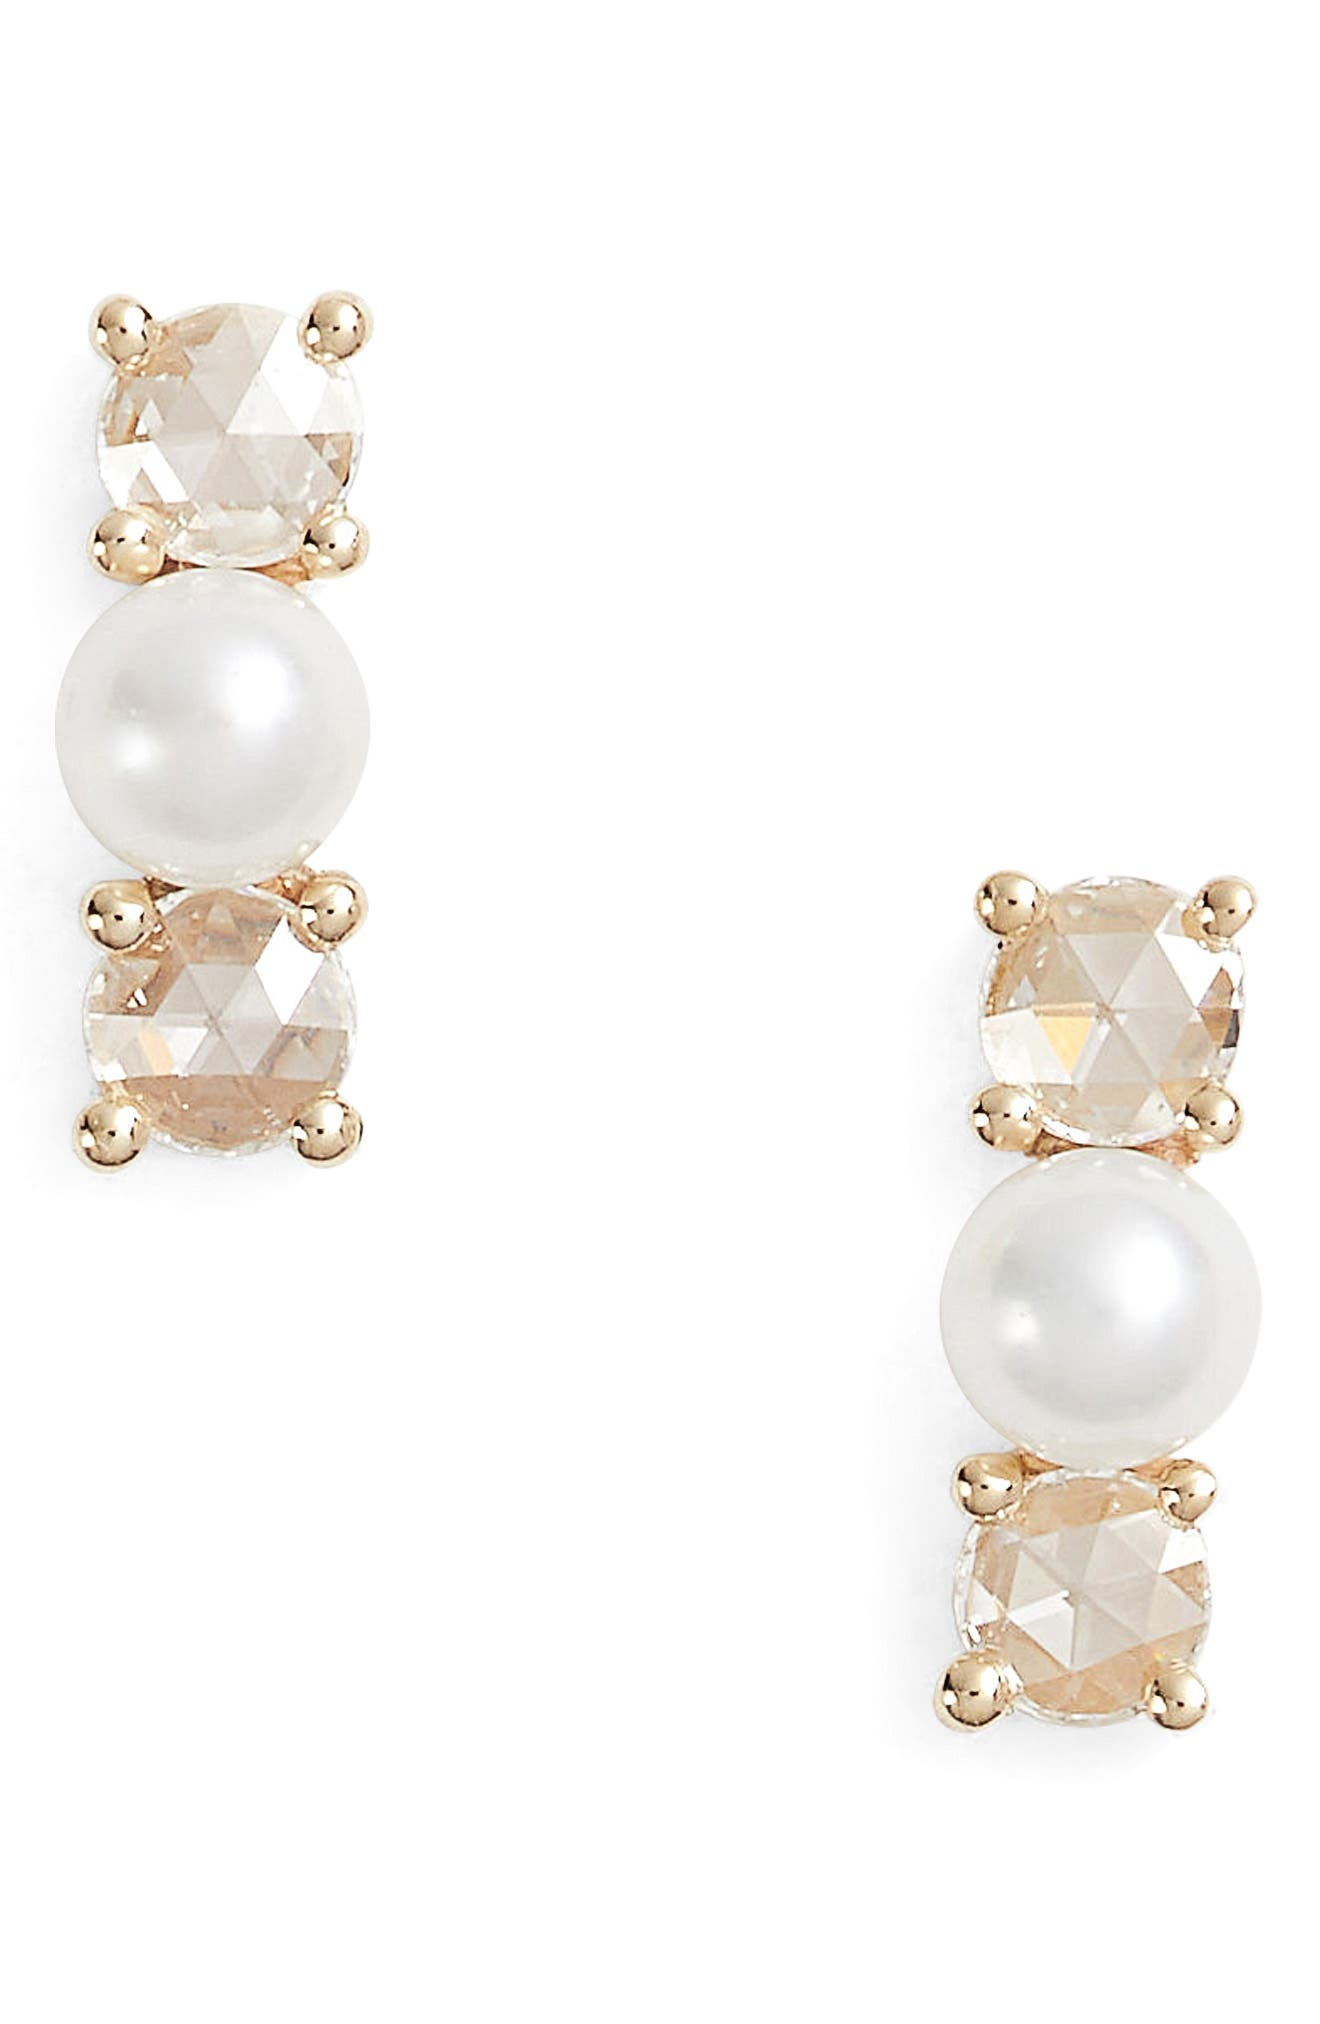 Main Image - EF COLLECTION Mini Pearl & Diamond Stud Earrings